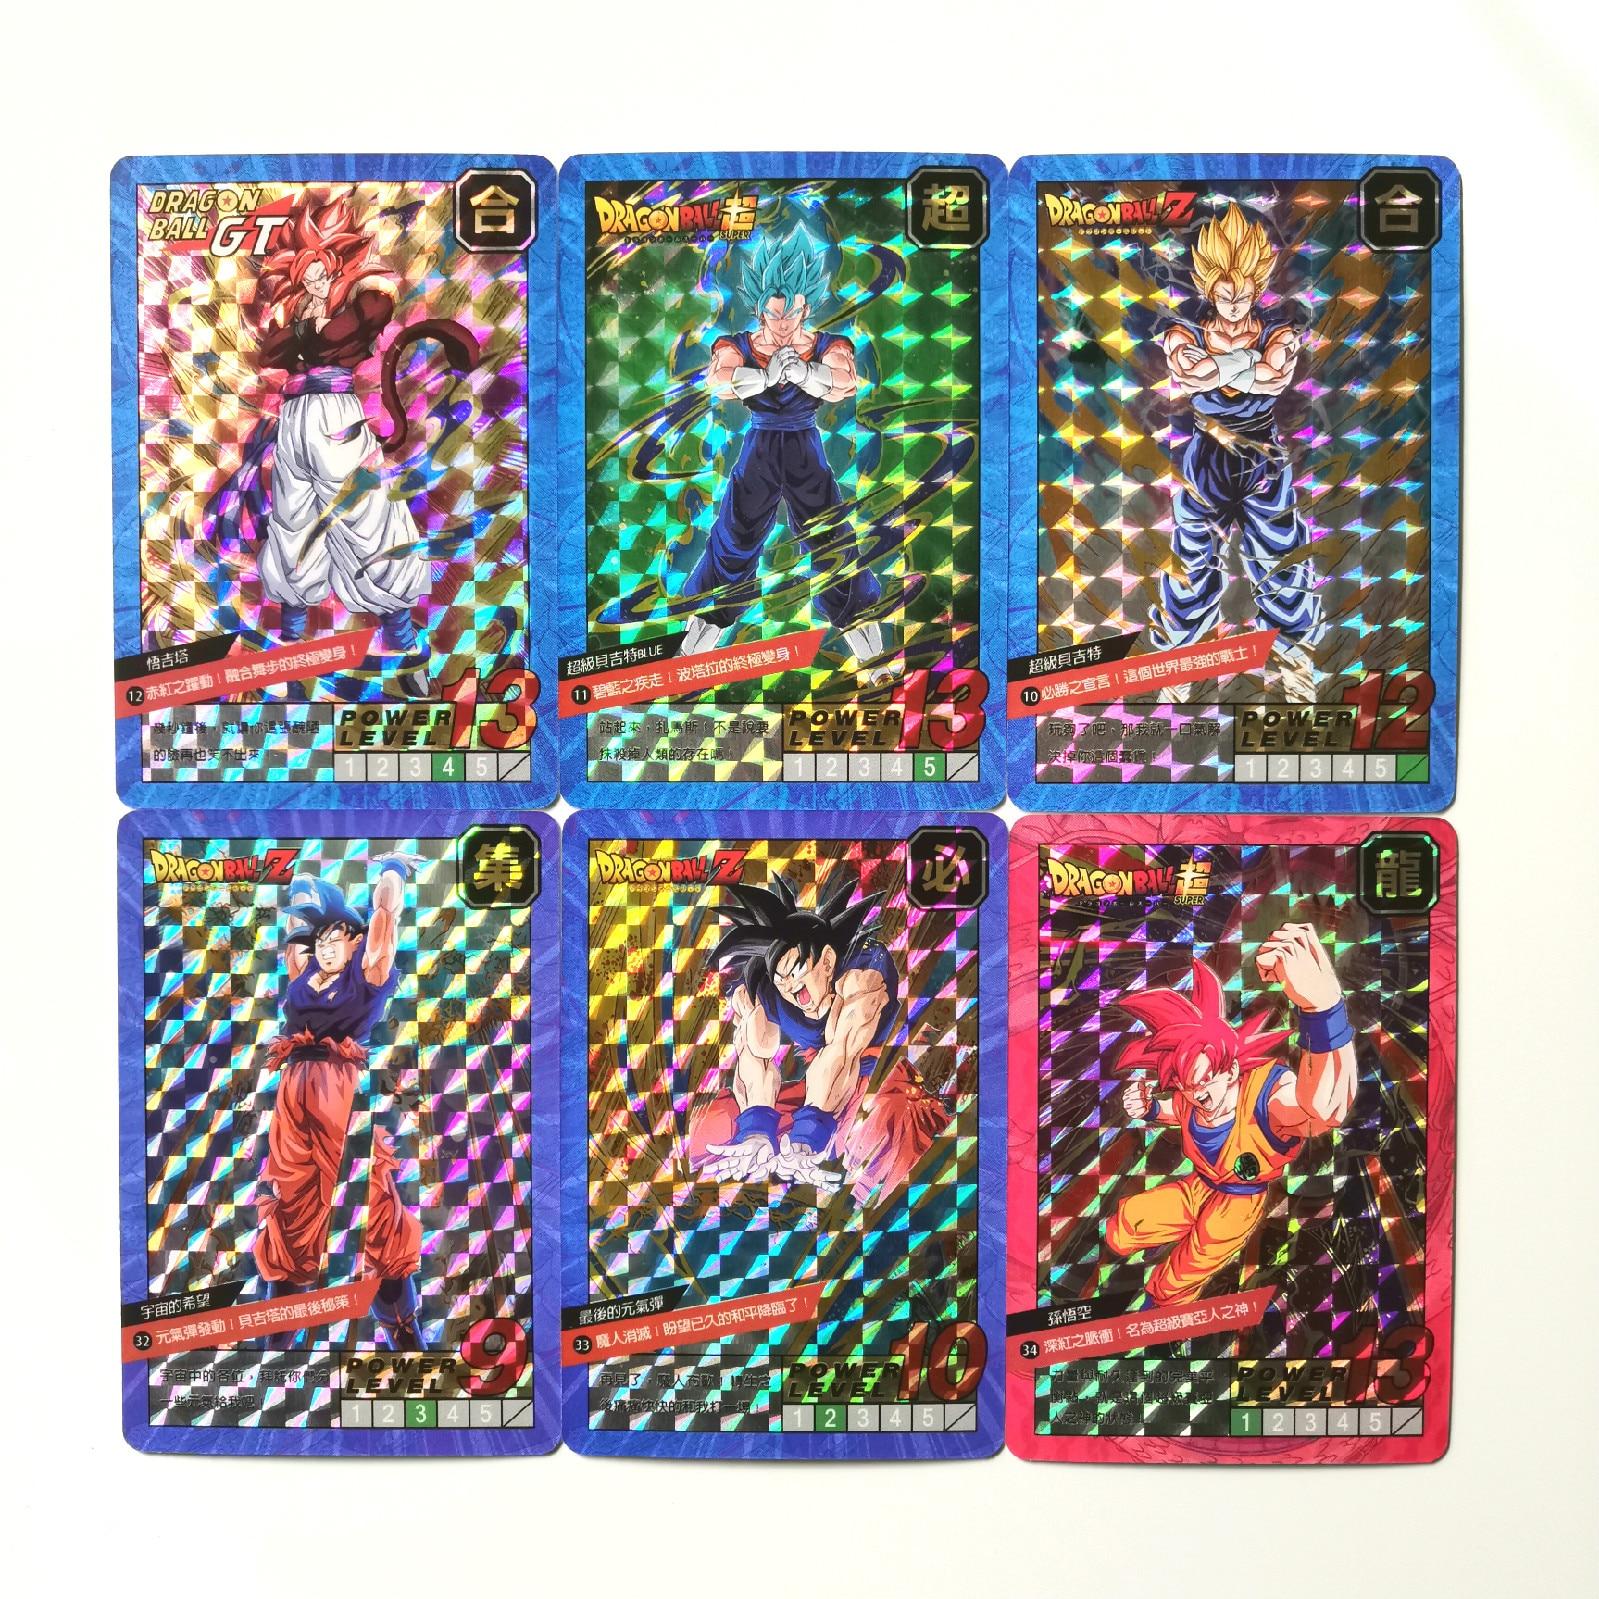 37pcs Super Dragon Ball Heroes Battle Card Ultra Instinct Goku Jiren Hit Kale Vegeta Dragon Ball Super Game Collection Cards